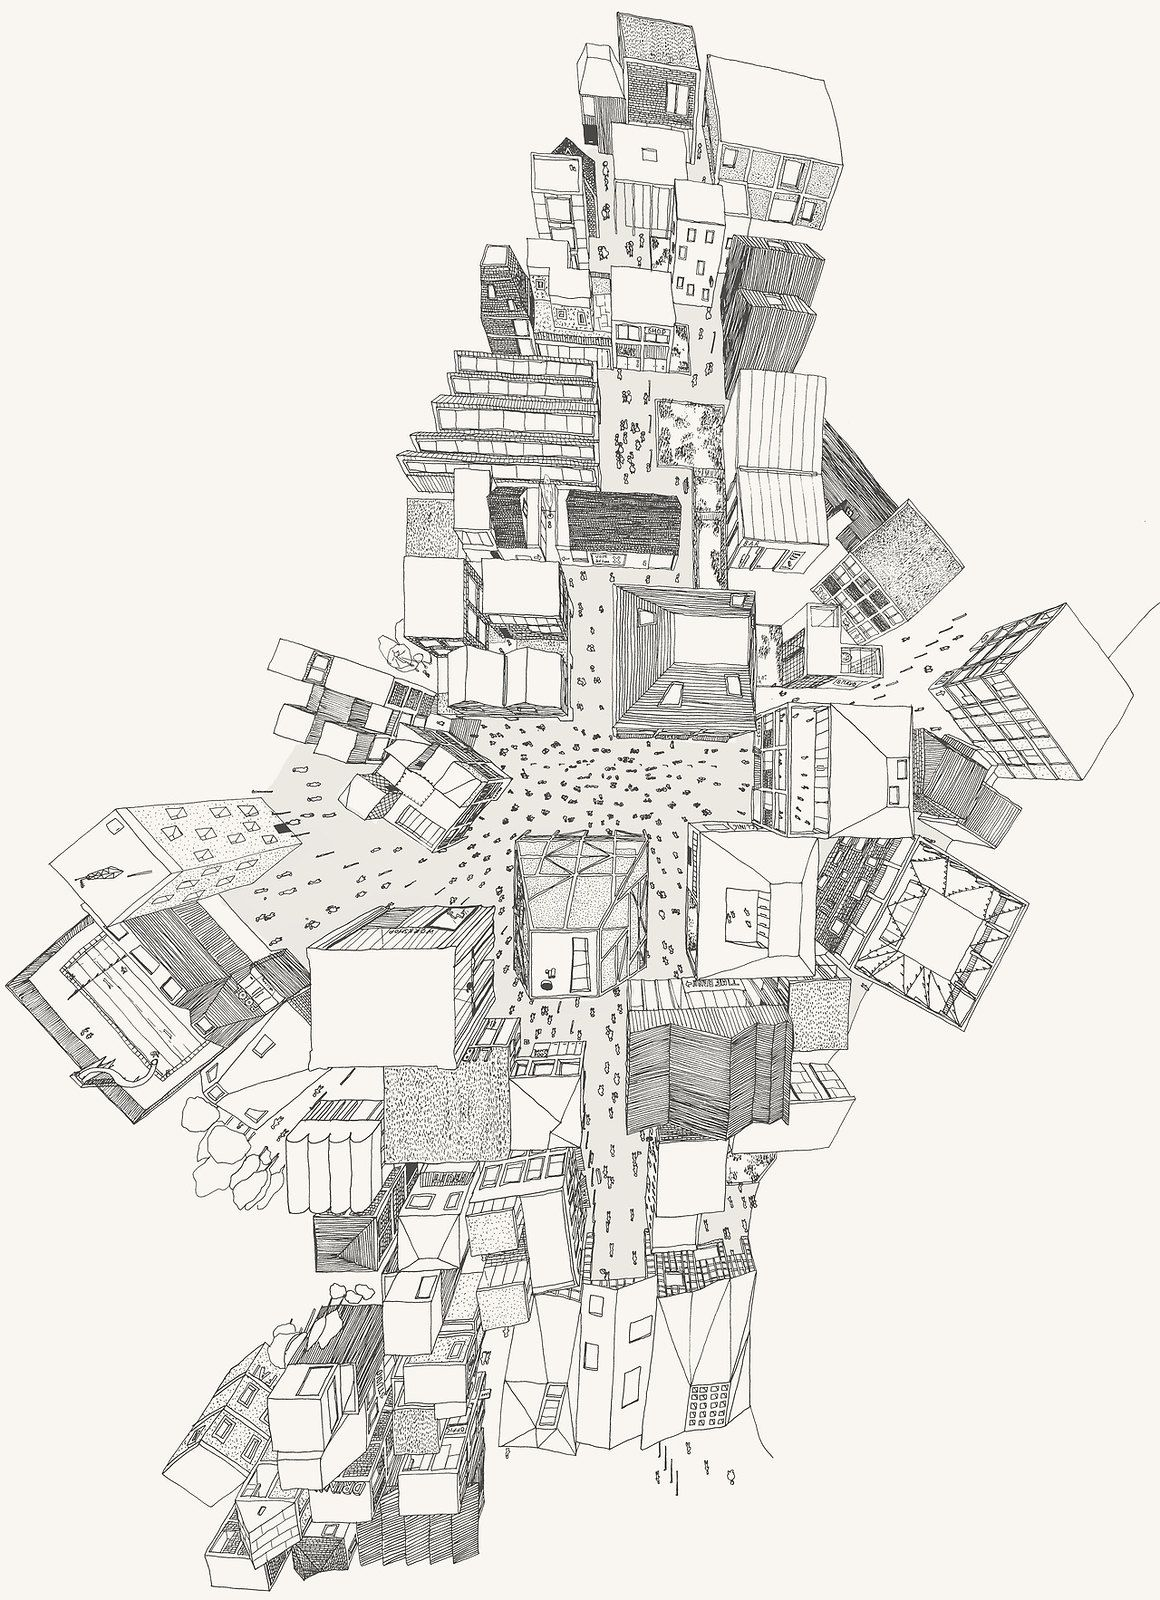 A Future High Street By Neil Michels Studio 7 Sheffield